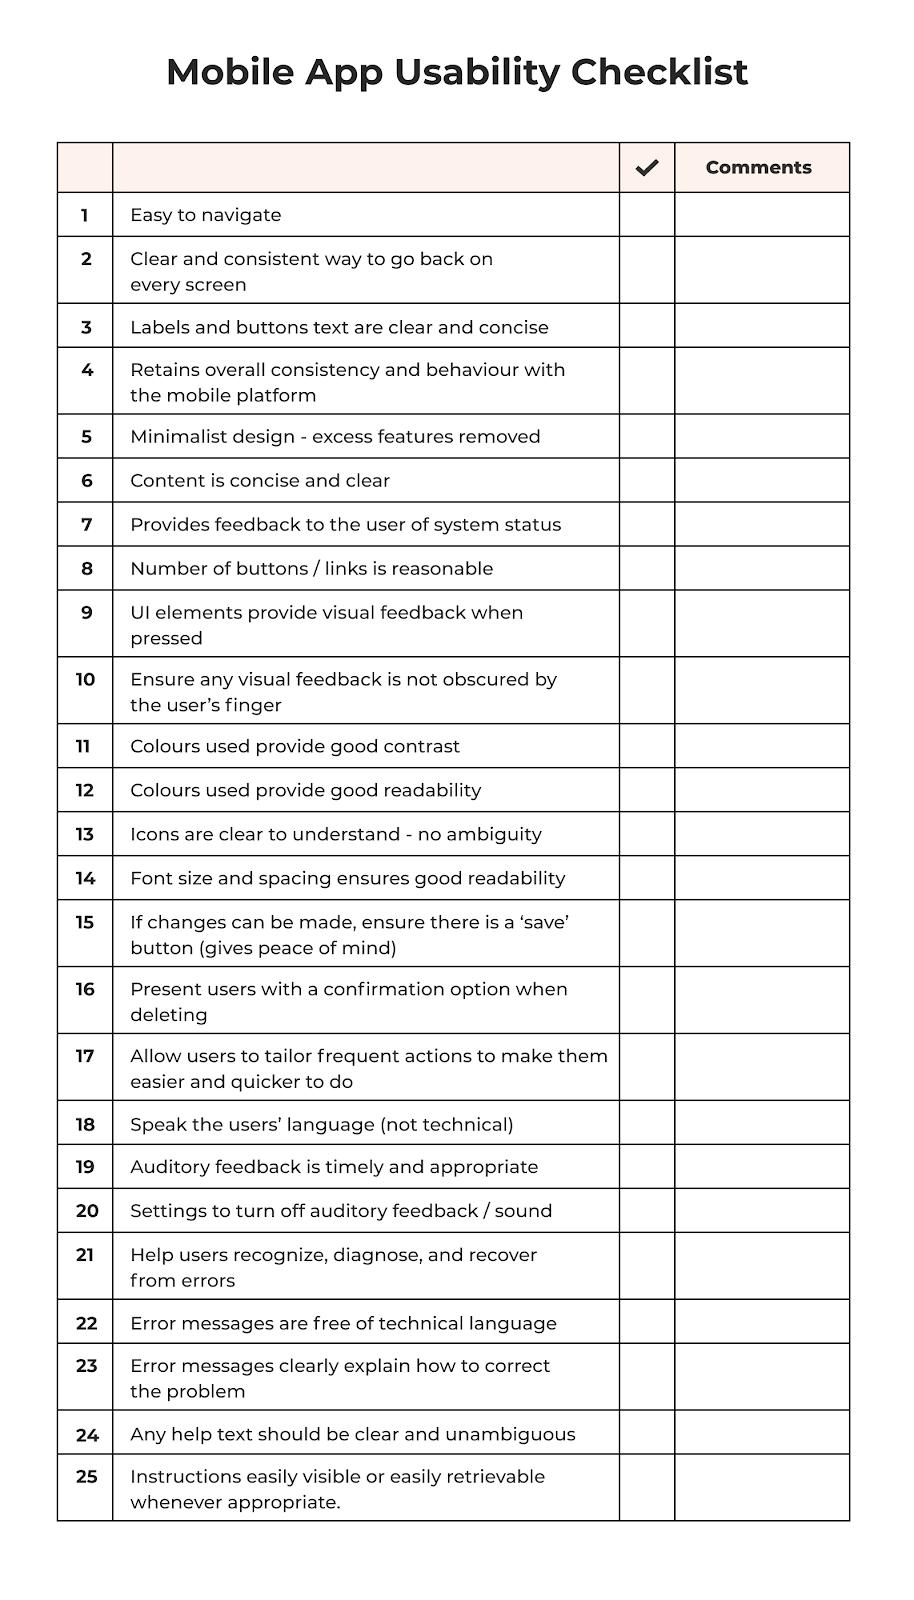 Mobile app usability checklist